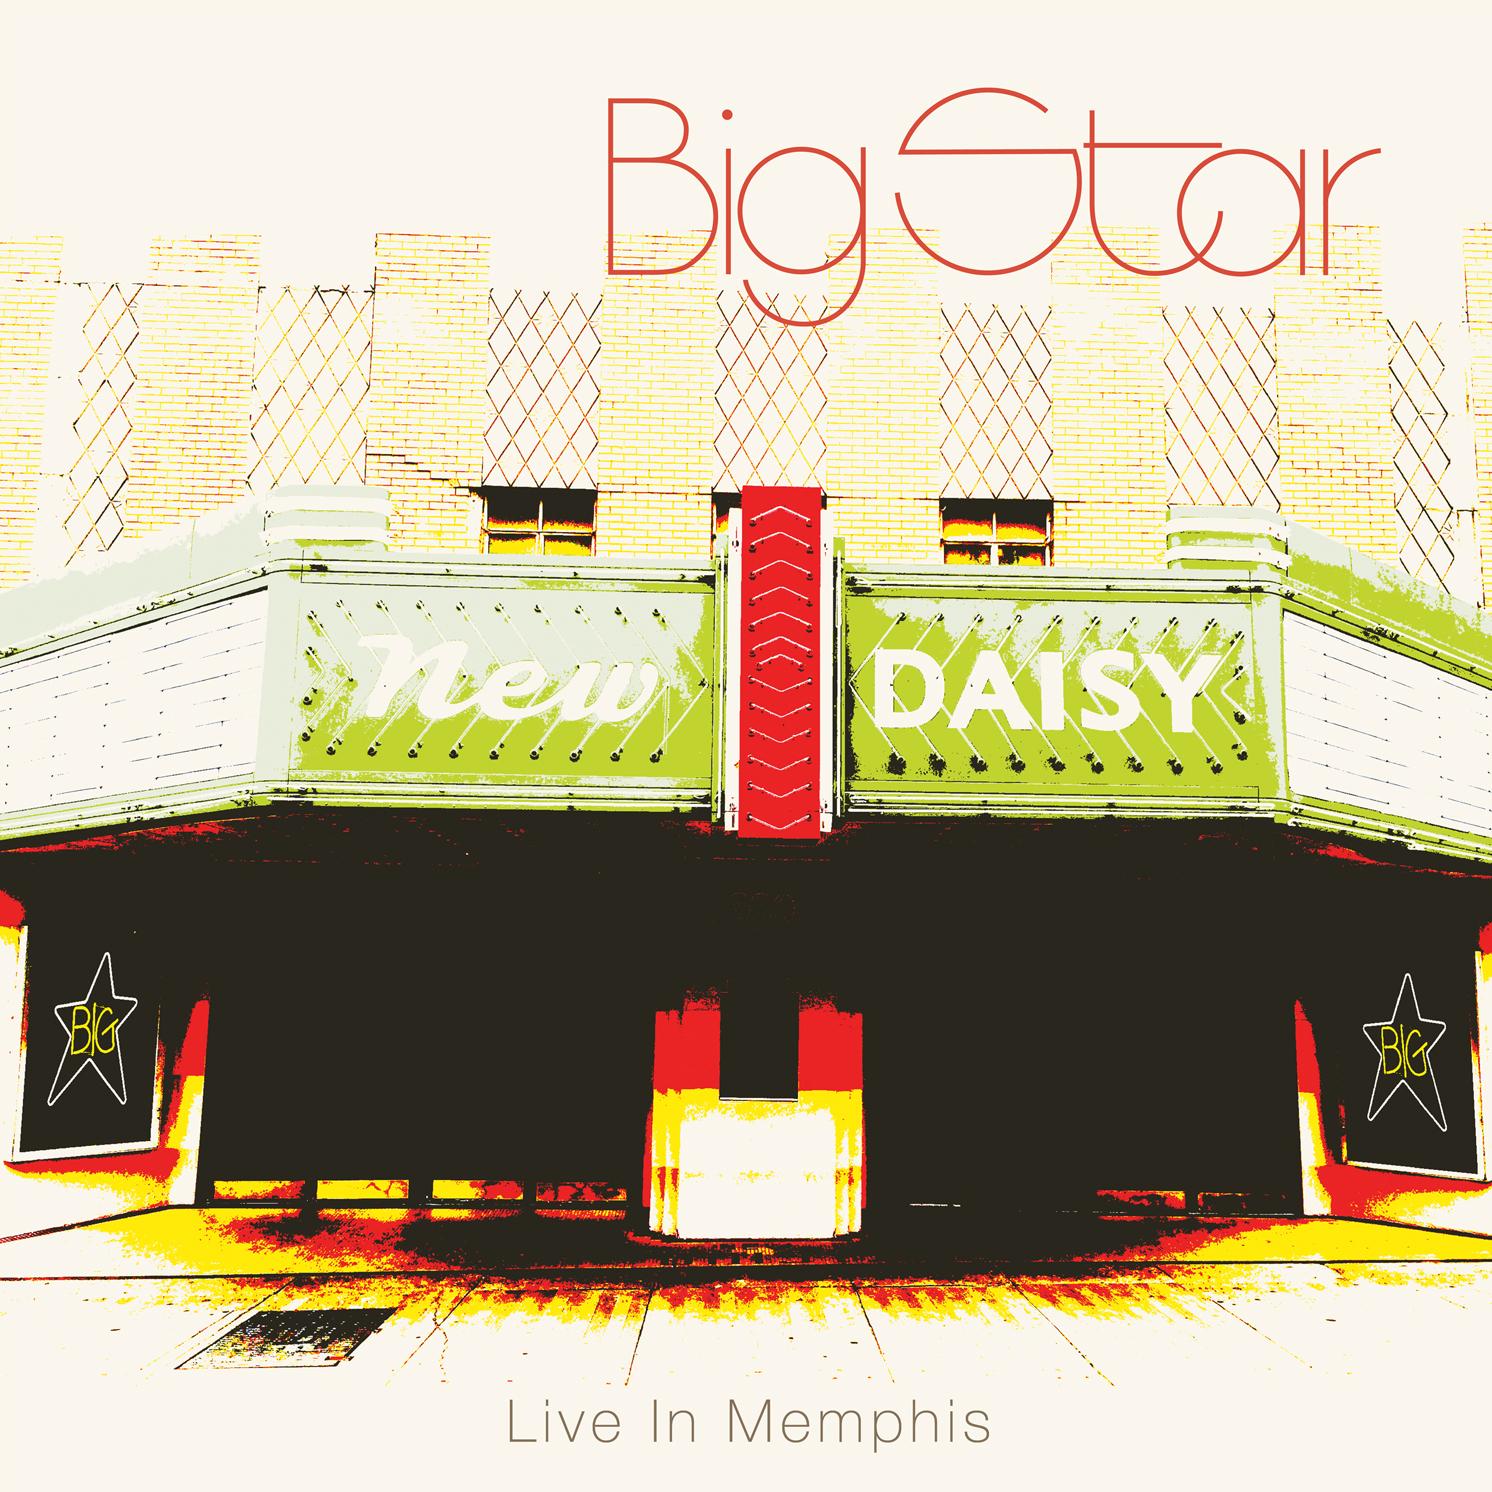 Big Star - Live In Memphis  Release Date: November 4, 2014 Label: Omnivore Recordings  SERVICE: Restoration NUMBER OF DISCS: 1 GENRE: Rock FORMAT: CD and LP